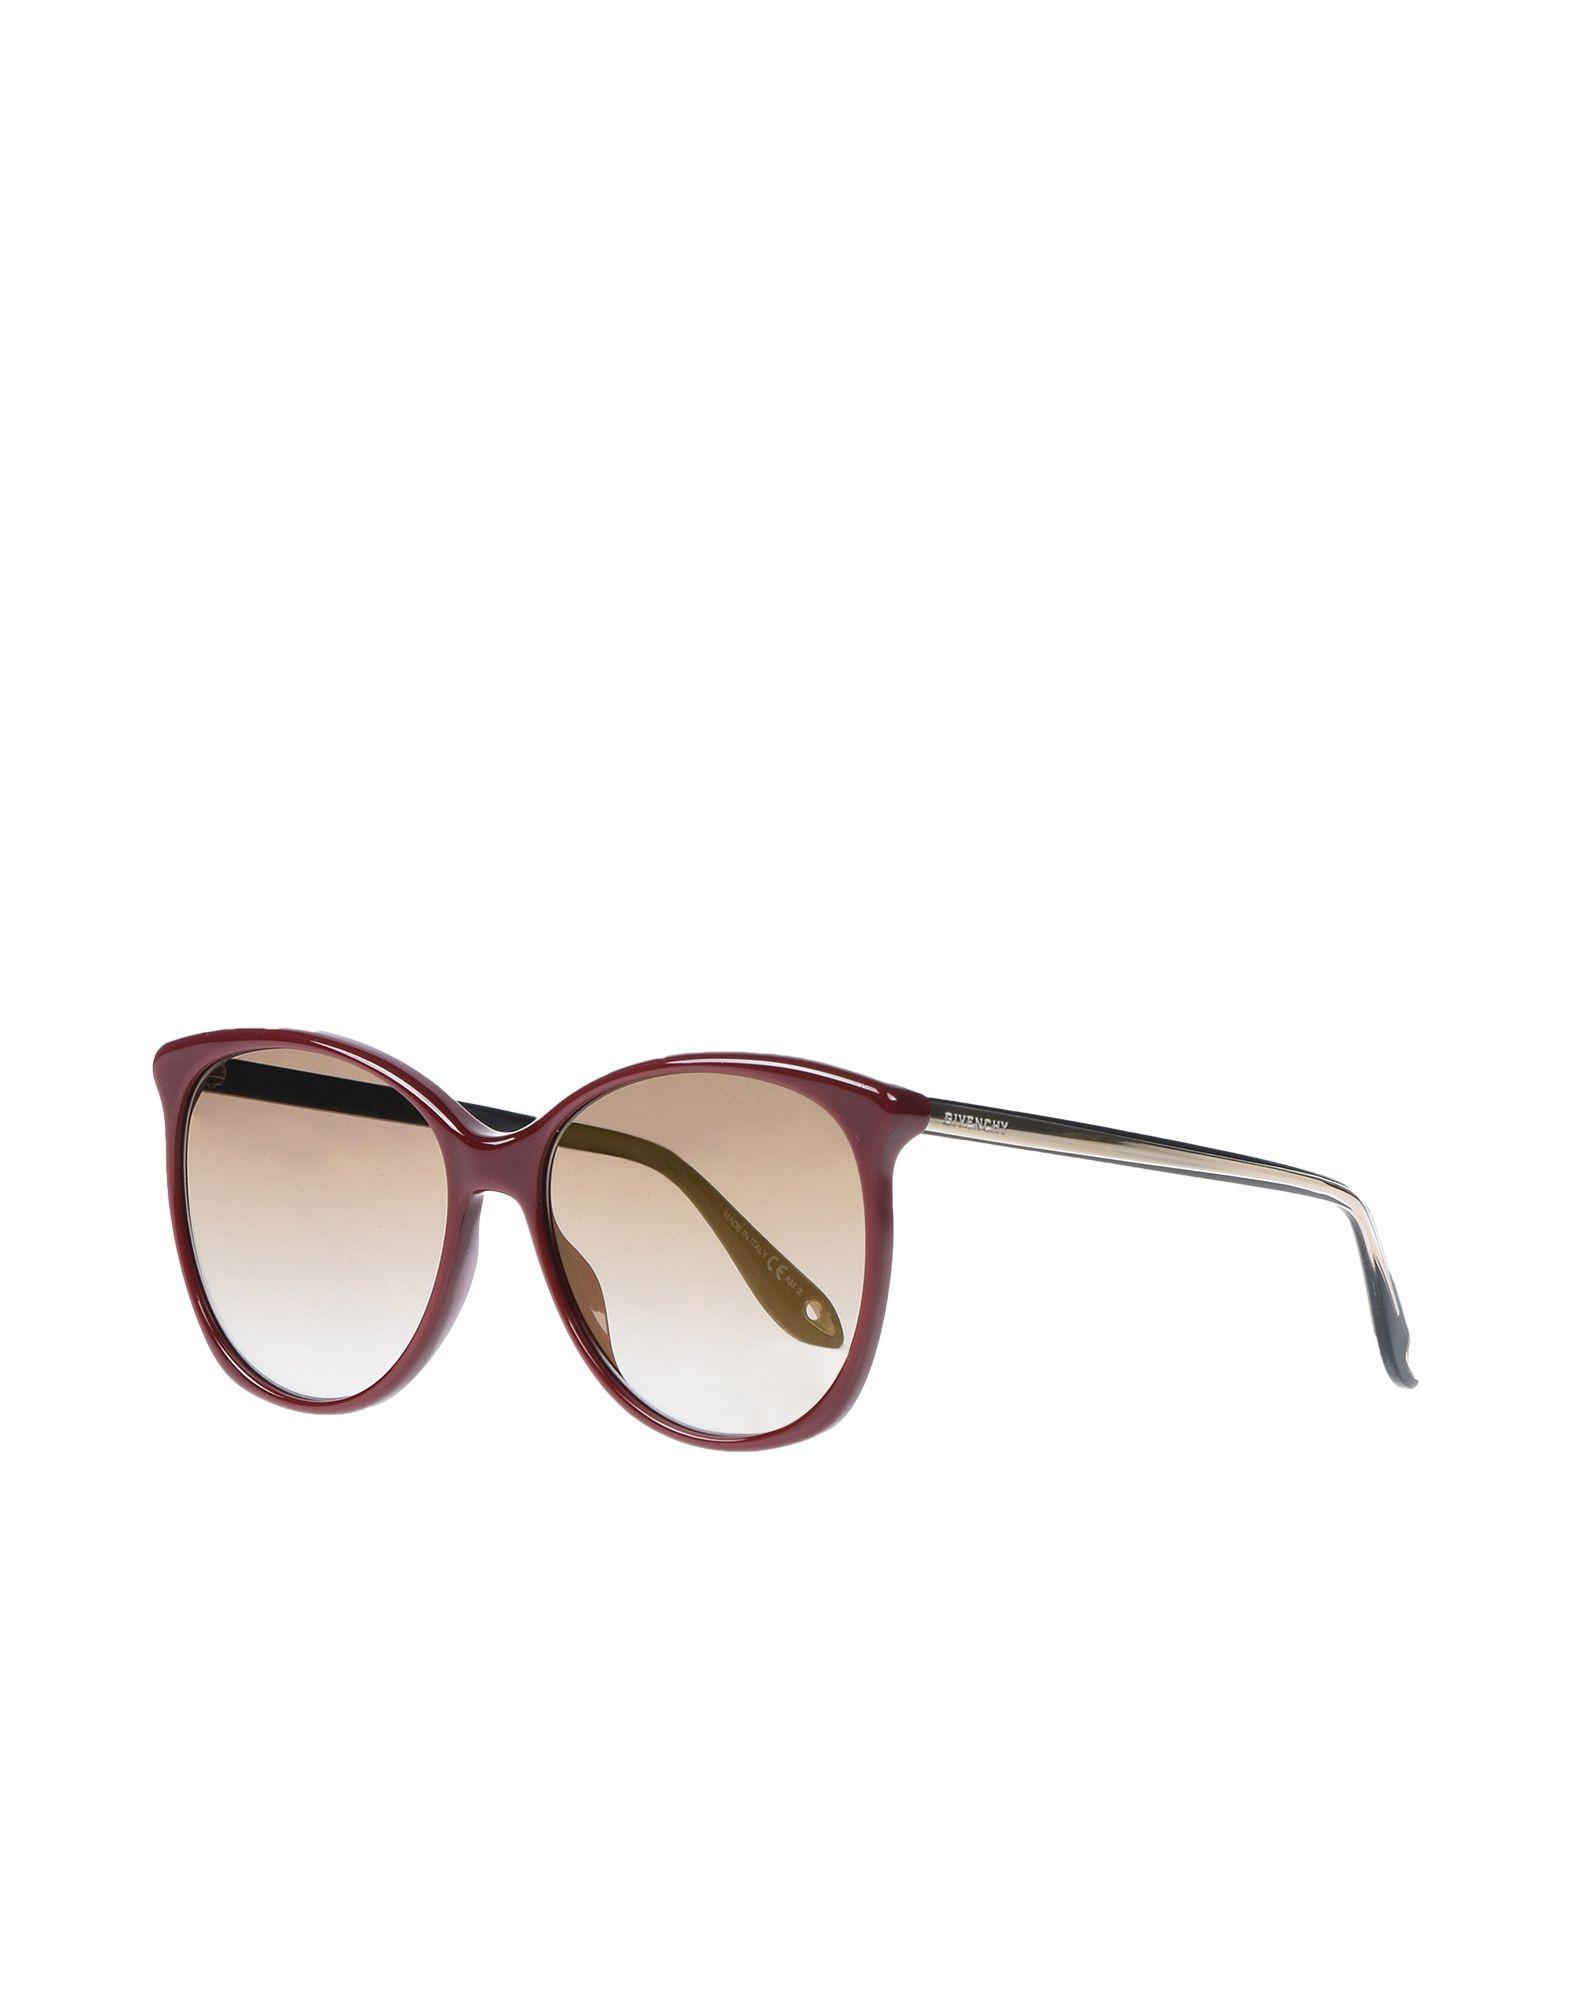 Фото - GIVENCHY Солнечные очки 3d очки